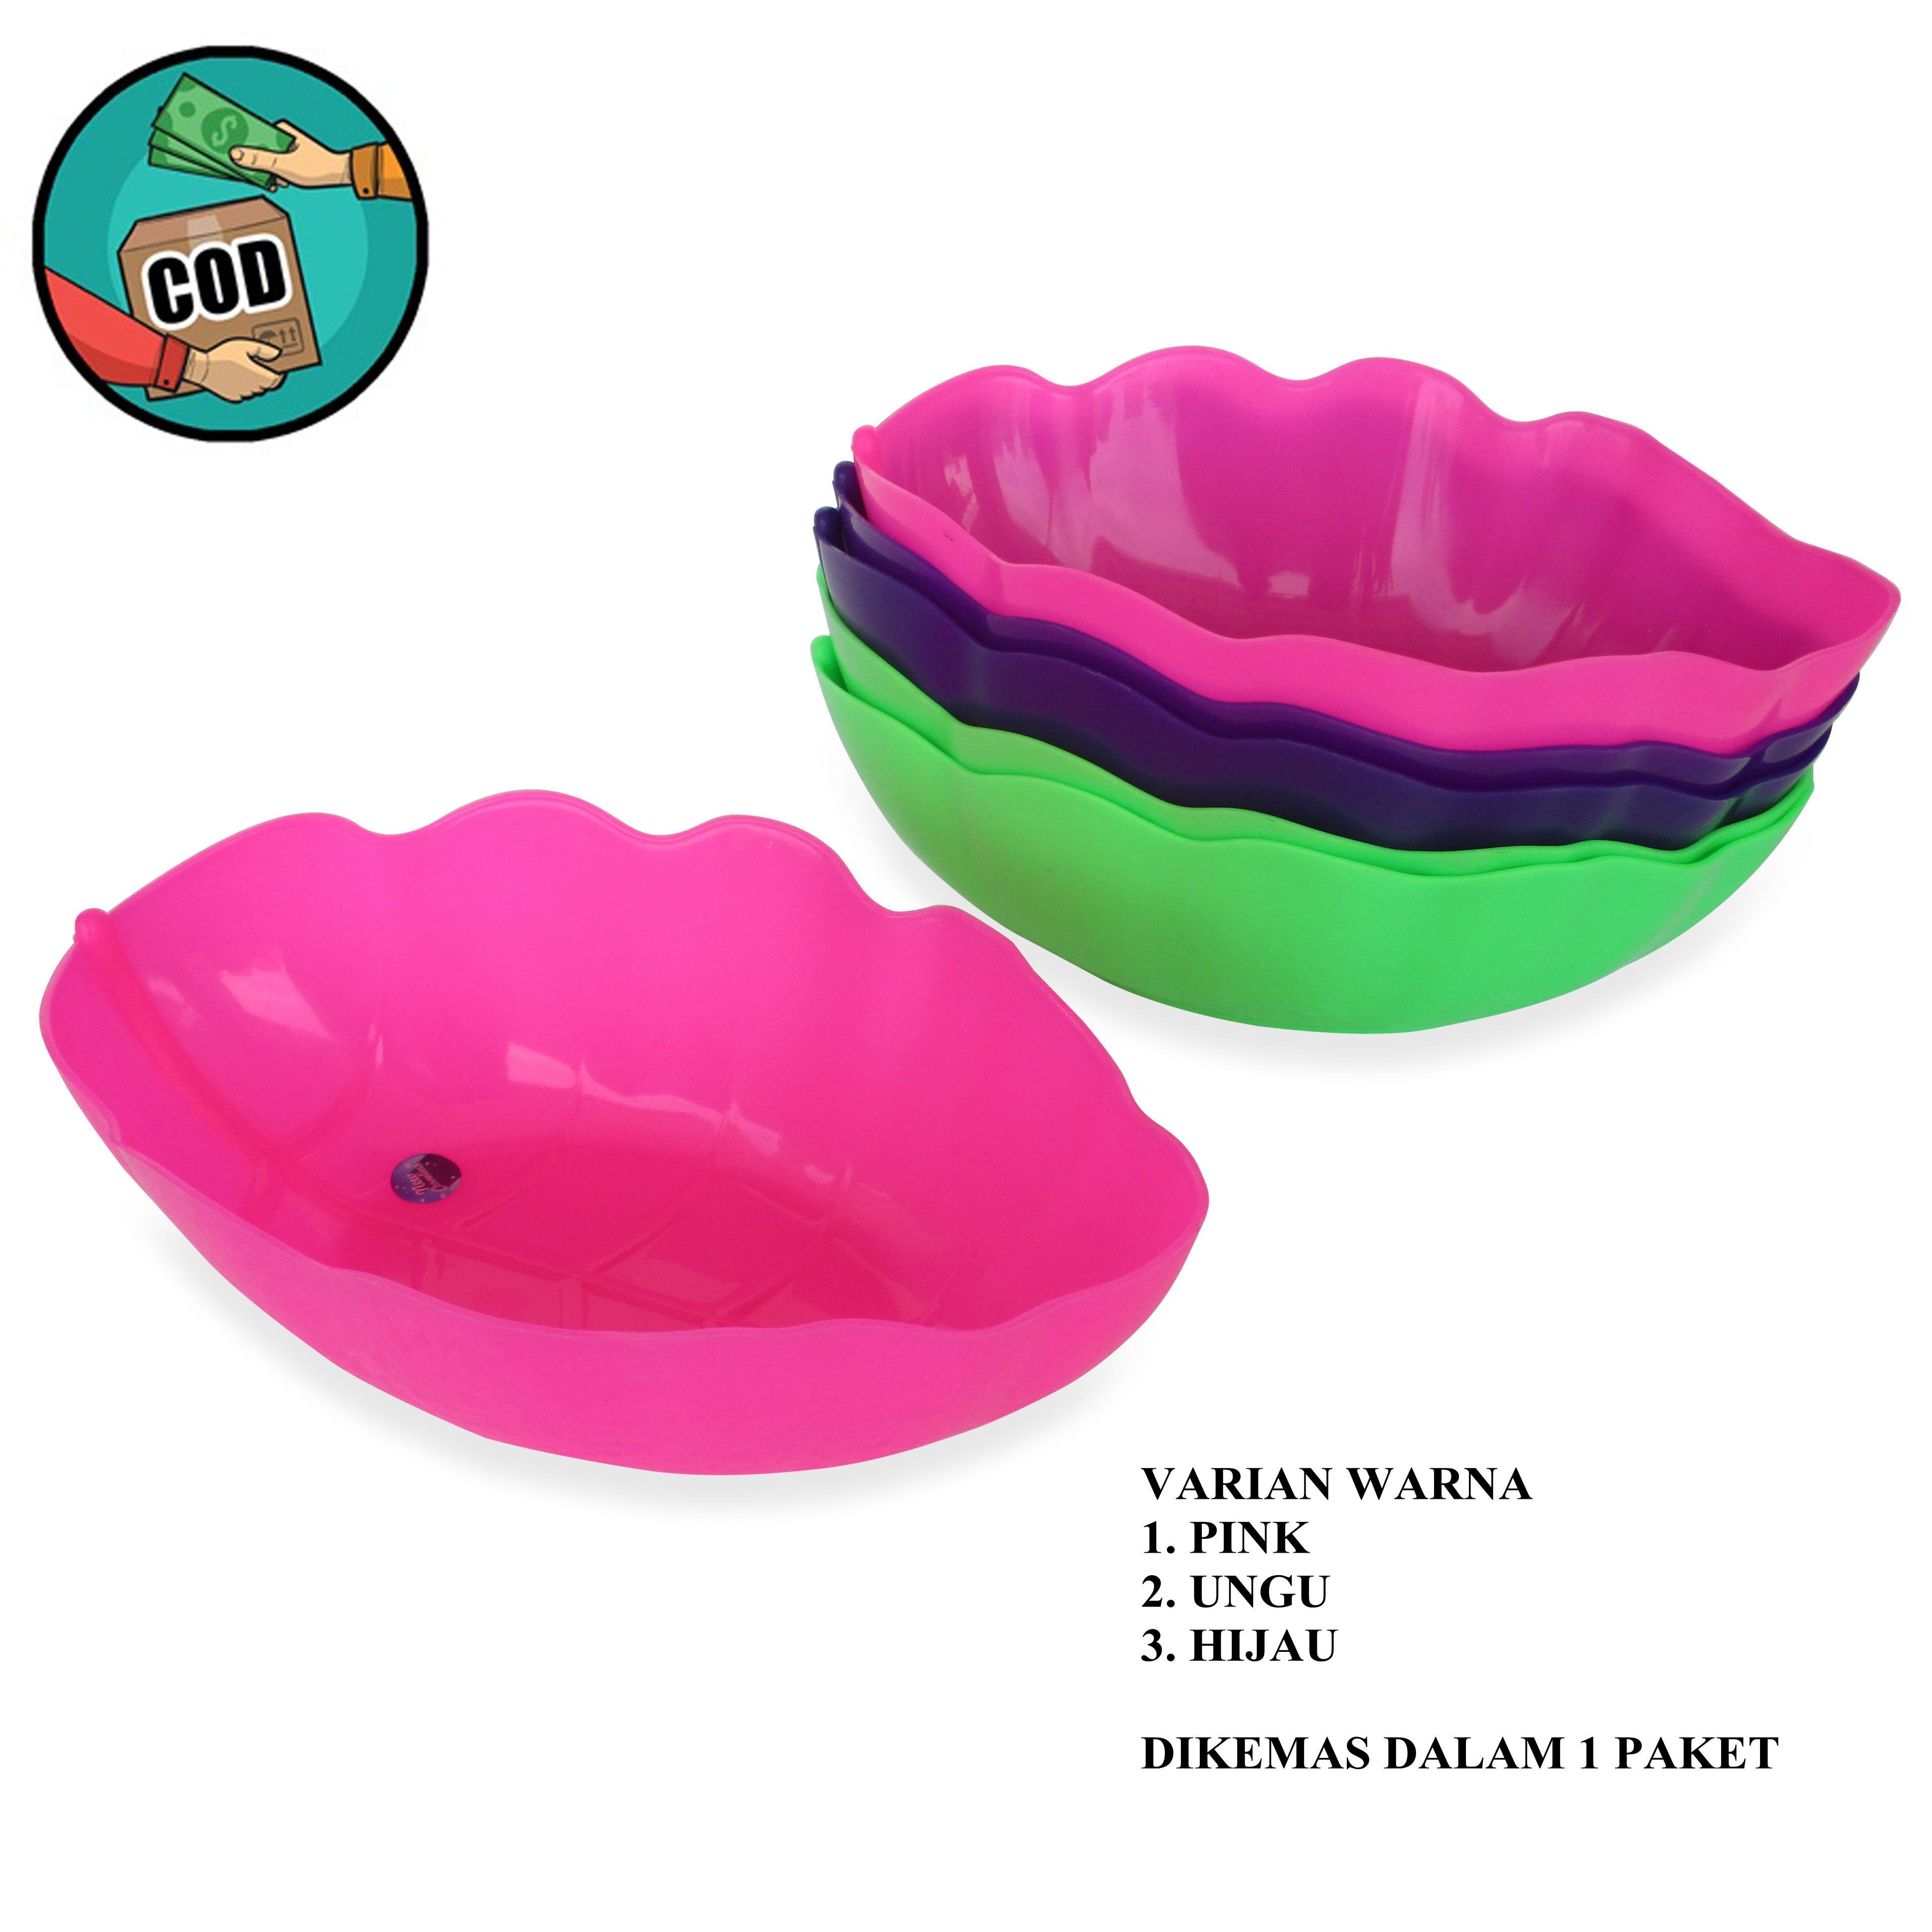 Mitra Loka Mangkok Daun Plastik Serbaguna Set 6Pieces - Multicolour